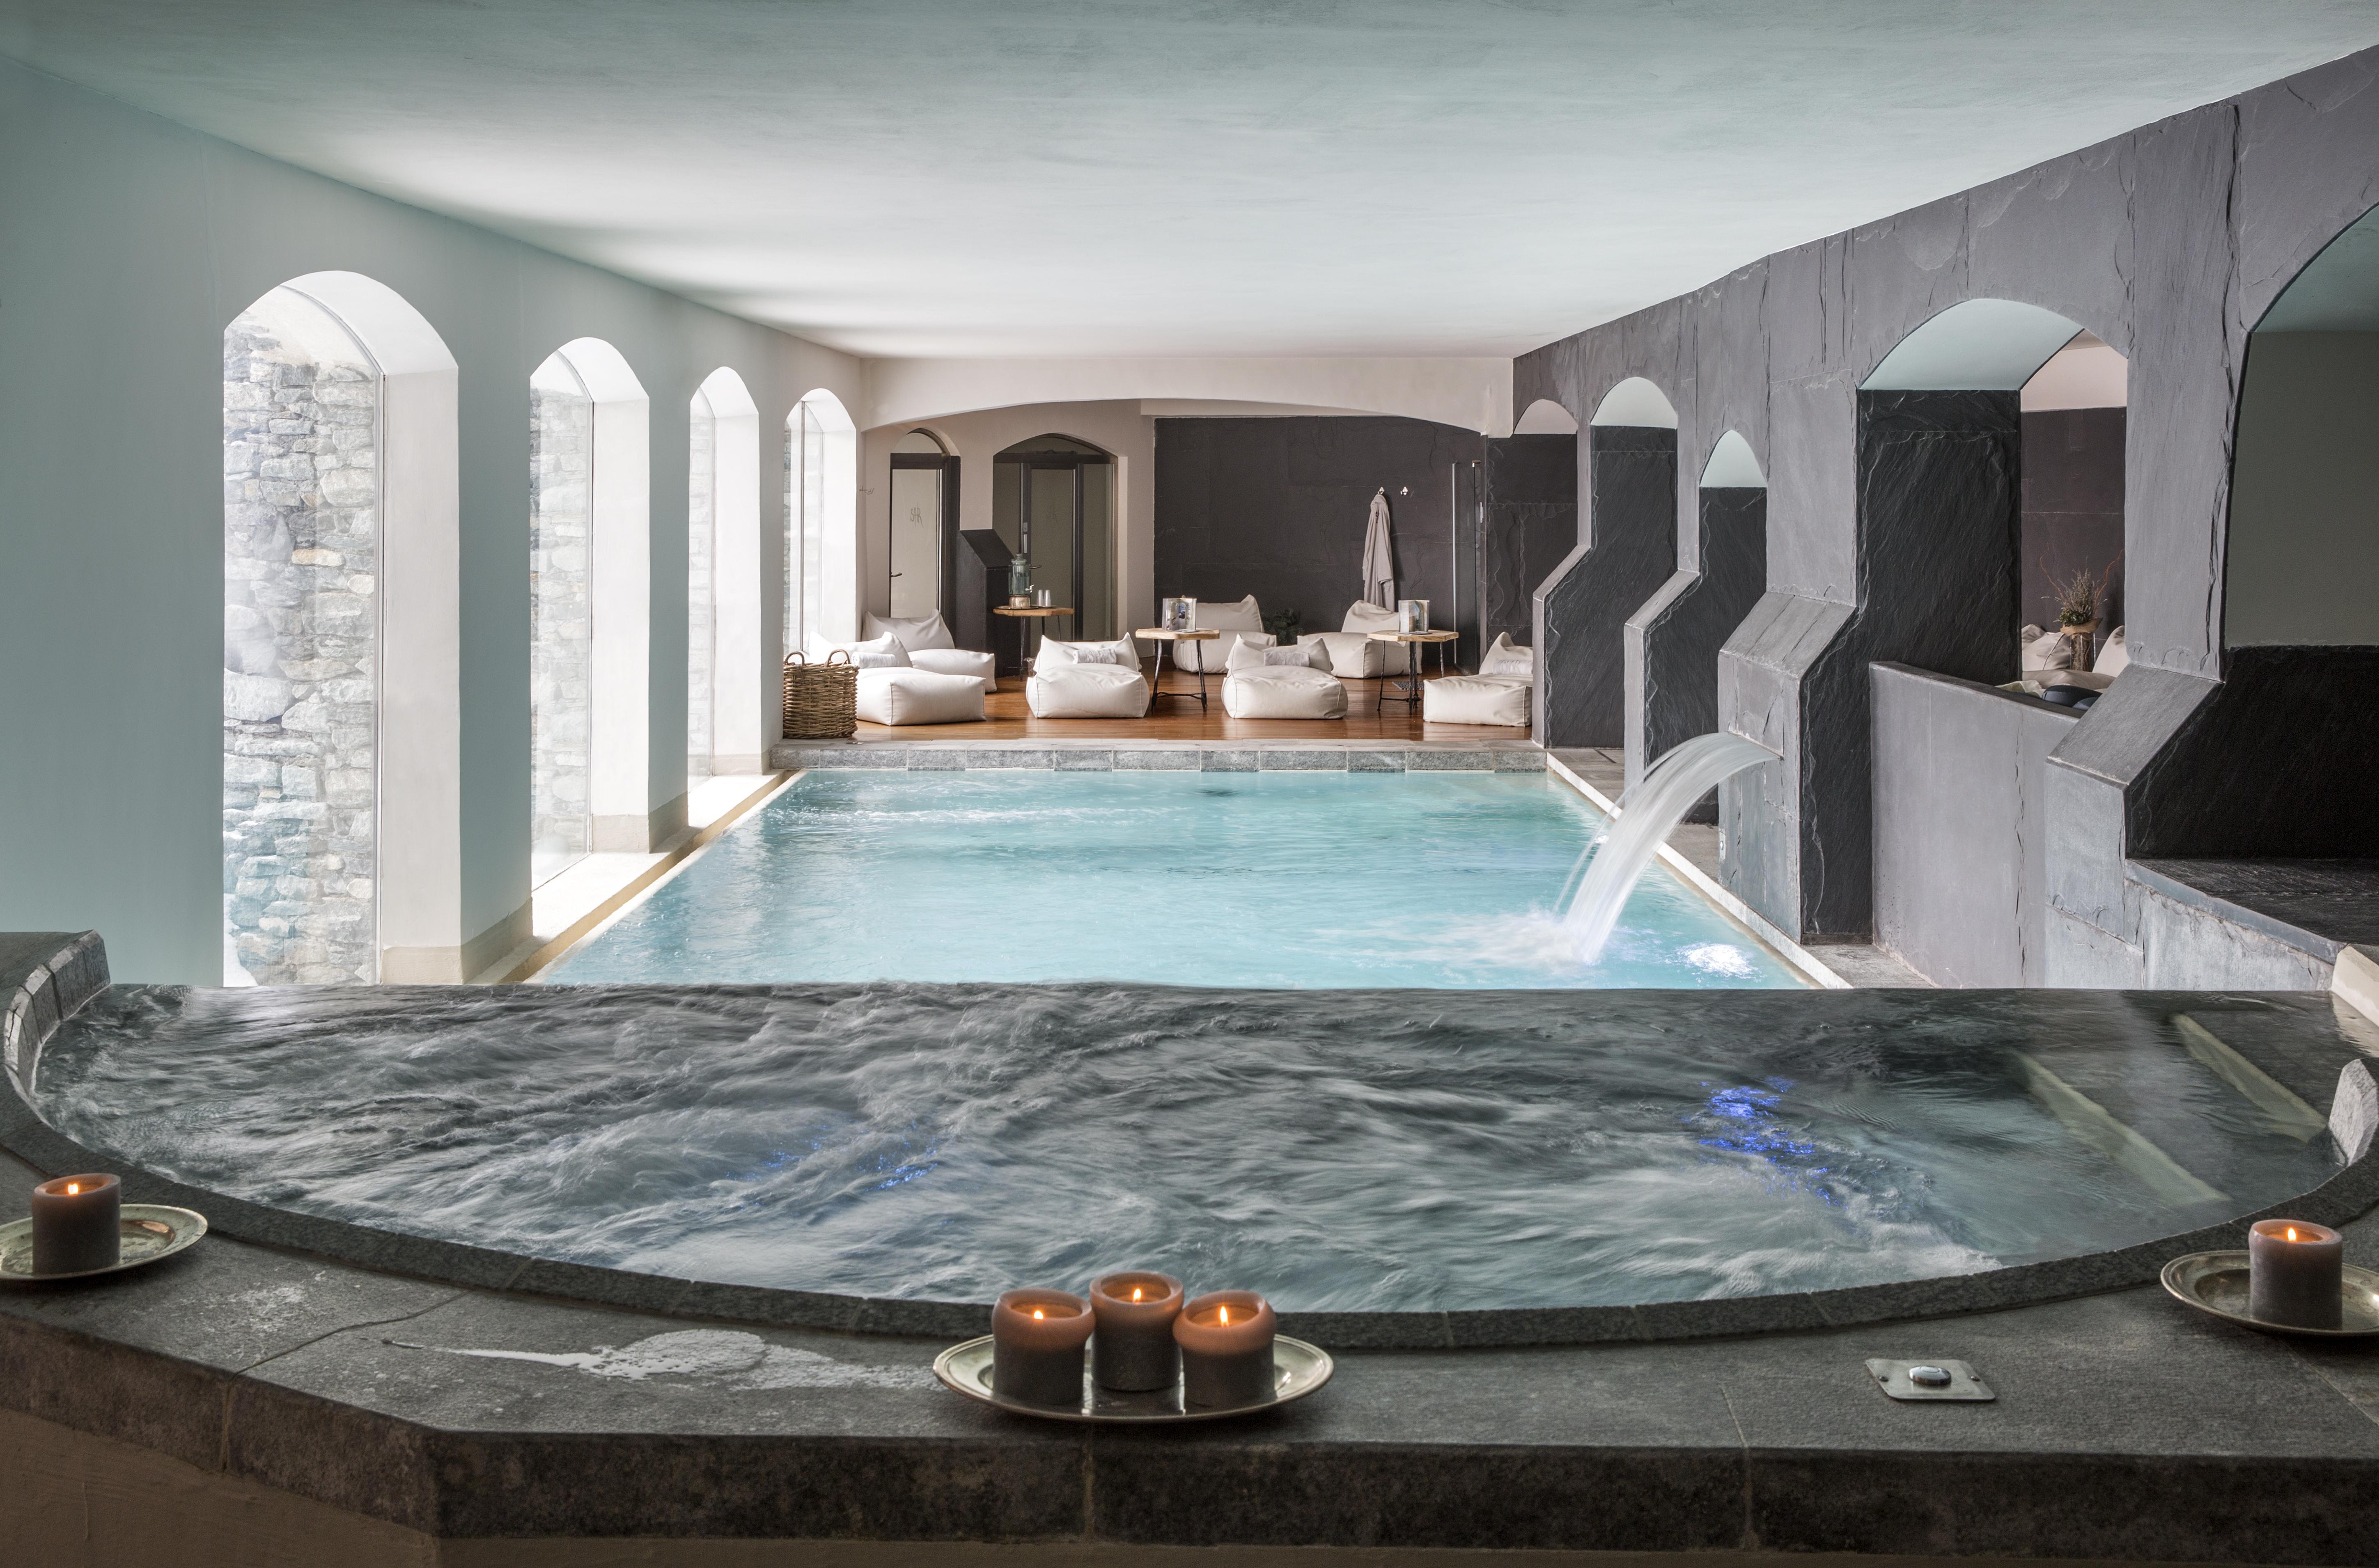 Saint Hubertus Resort Luxury Hotel and Spa, Cervinia, Italy